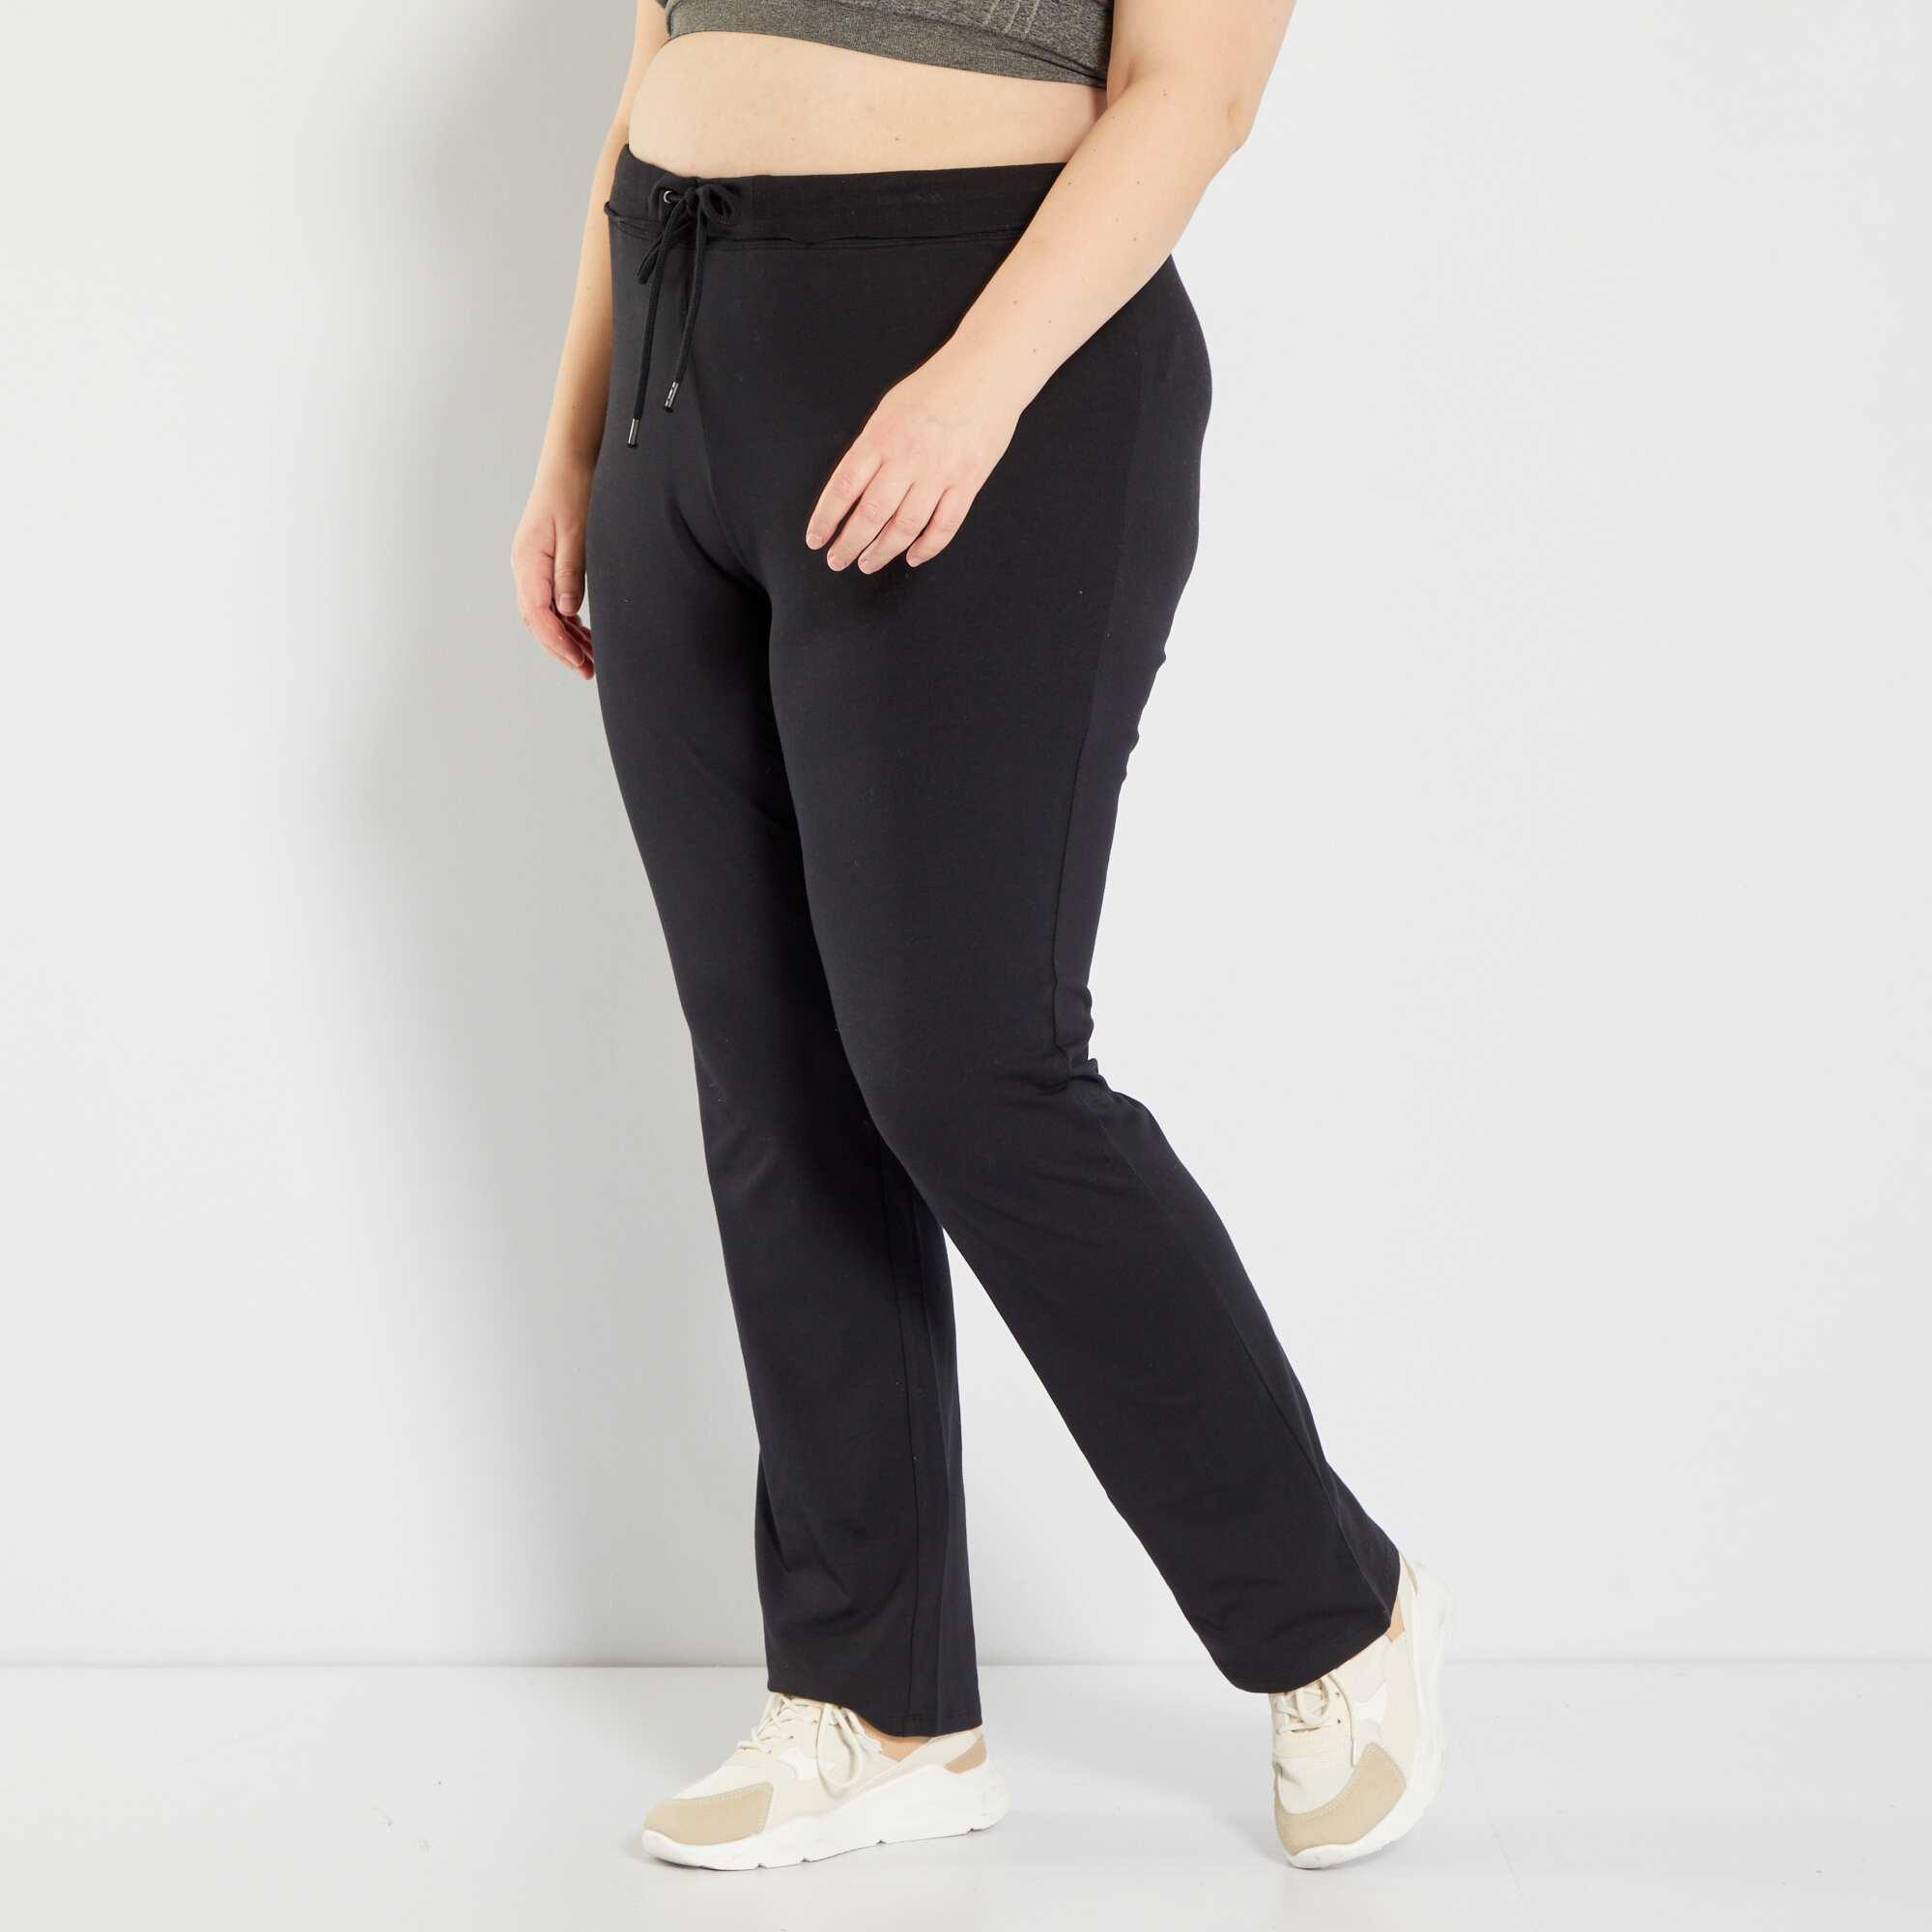 pantalon de sport en molleton grande taille femme noir kiabi 10 00. Black Bedroom Furniture Sets. Home Design Ideas